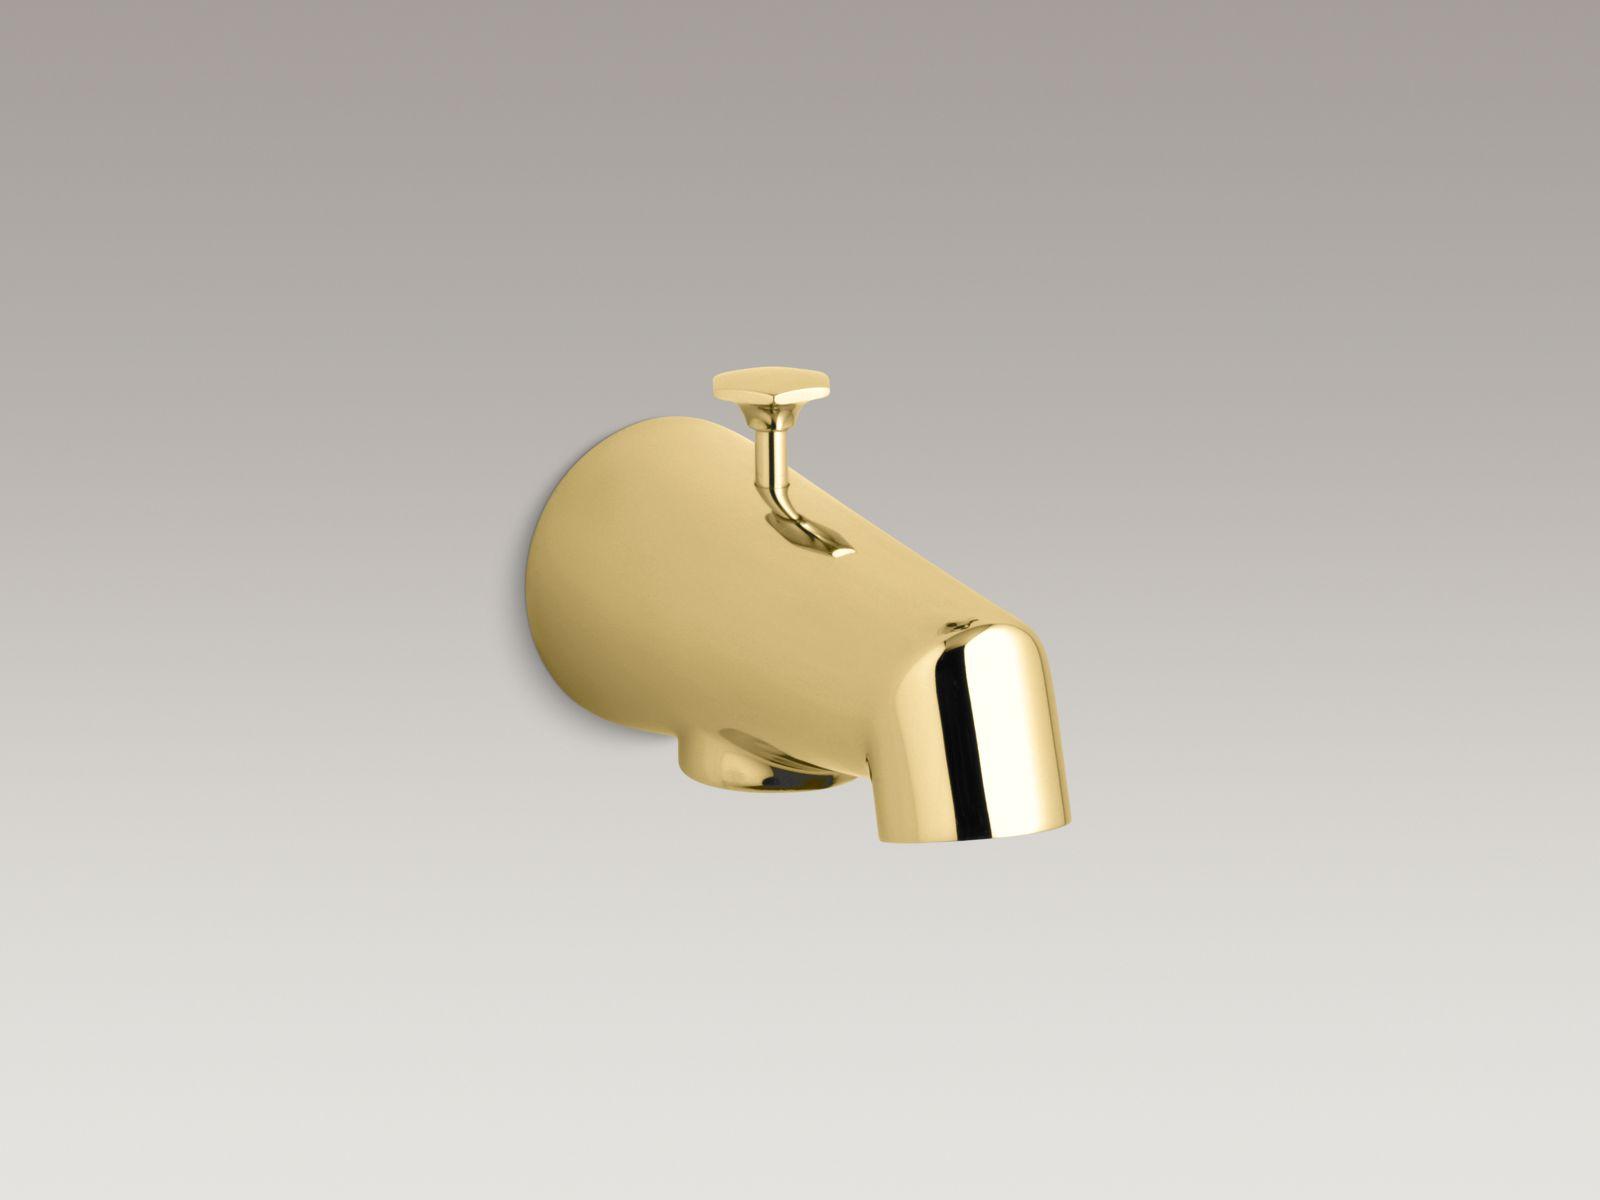 "Kohler K-6855-PB Standard Wall-mounted 5"" Diverter Bathtub Spout with Disc-shaped Knob Vibrant Polished Brass"